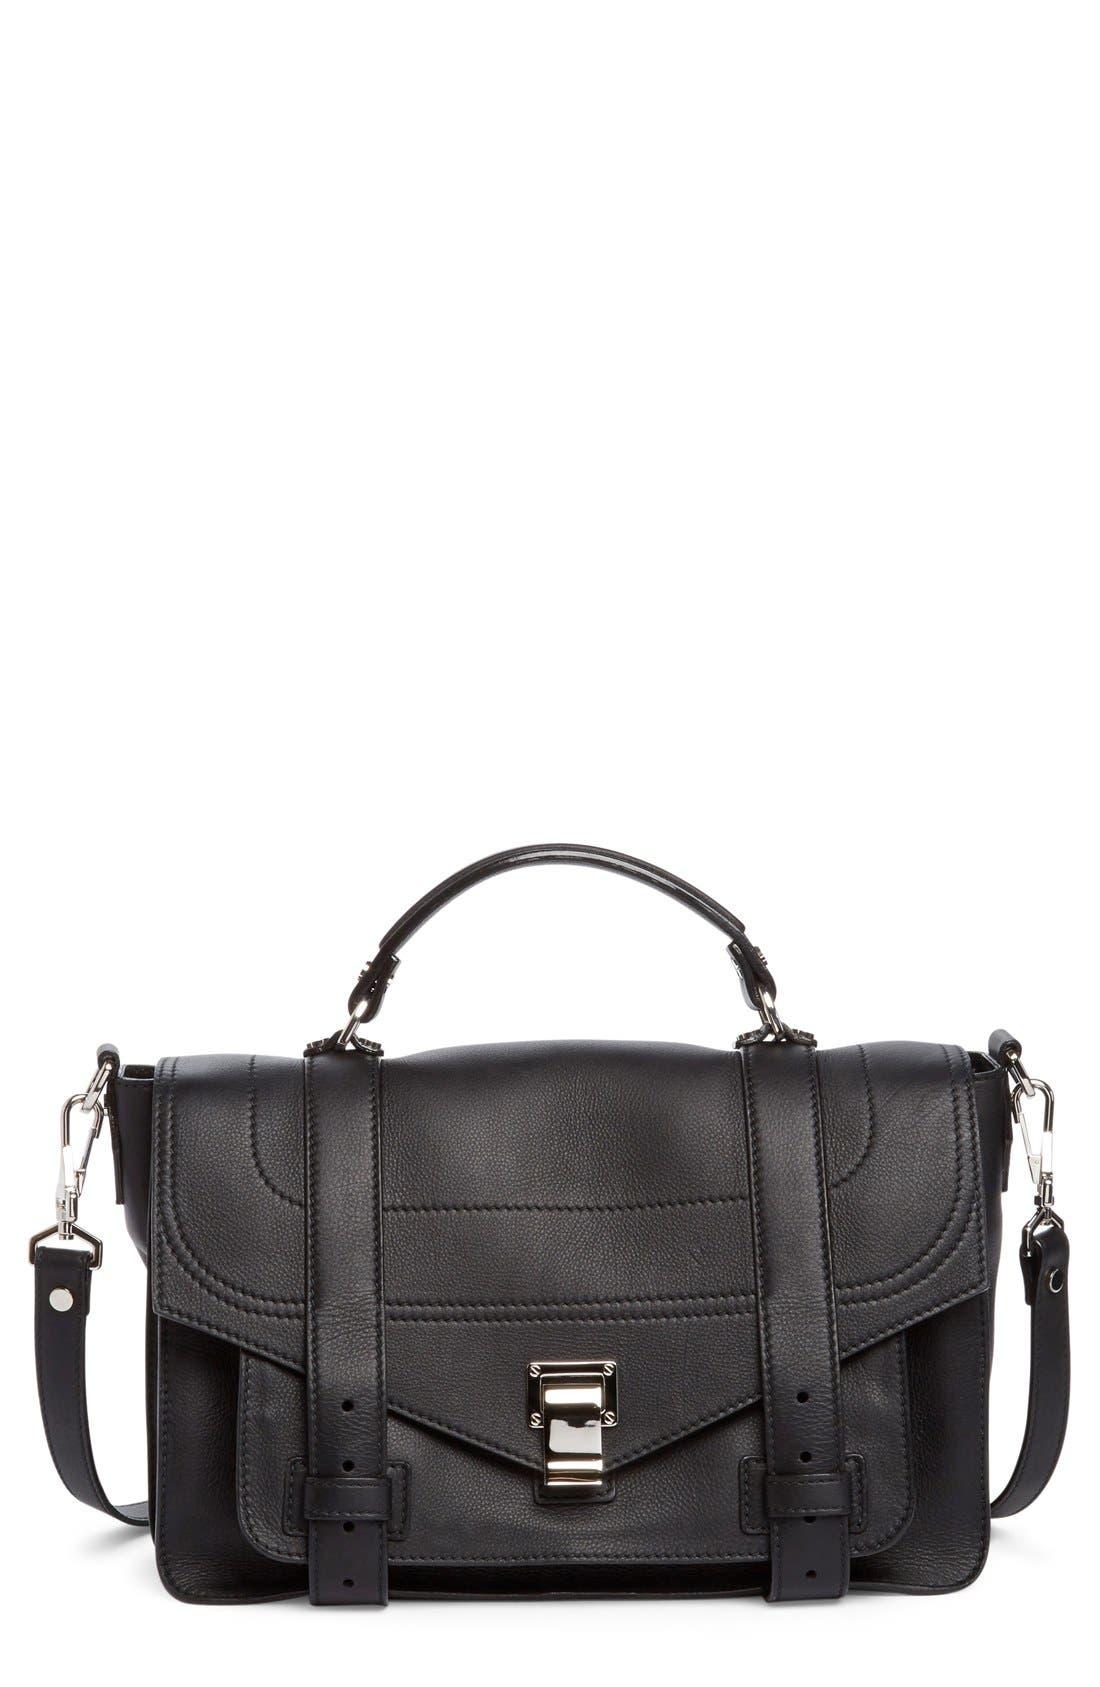 Medium PS1+ Grainy Leather Satchel,                         Main,                         color, 001